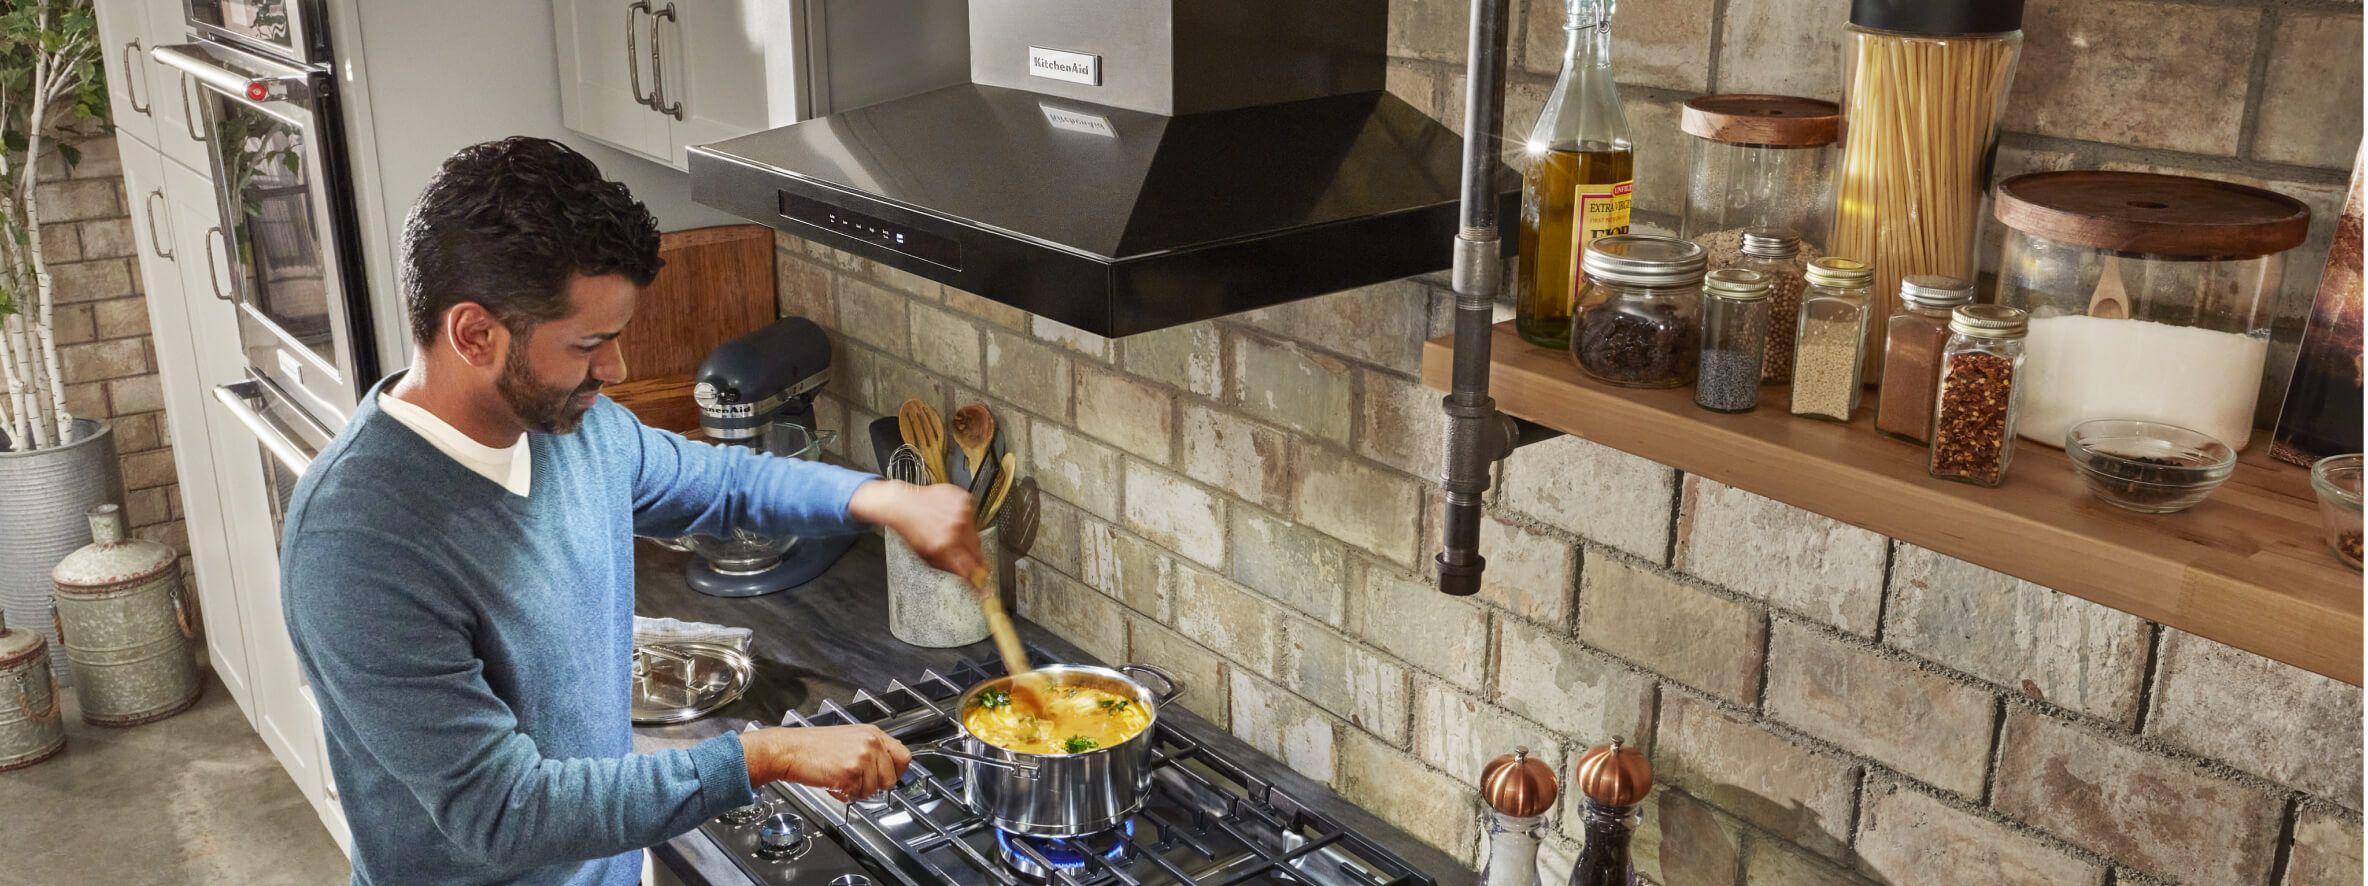 Man stirring a dish on a gas range with hood overhead